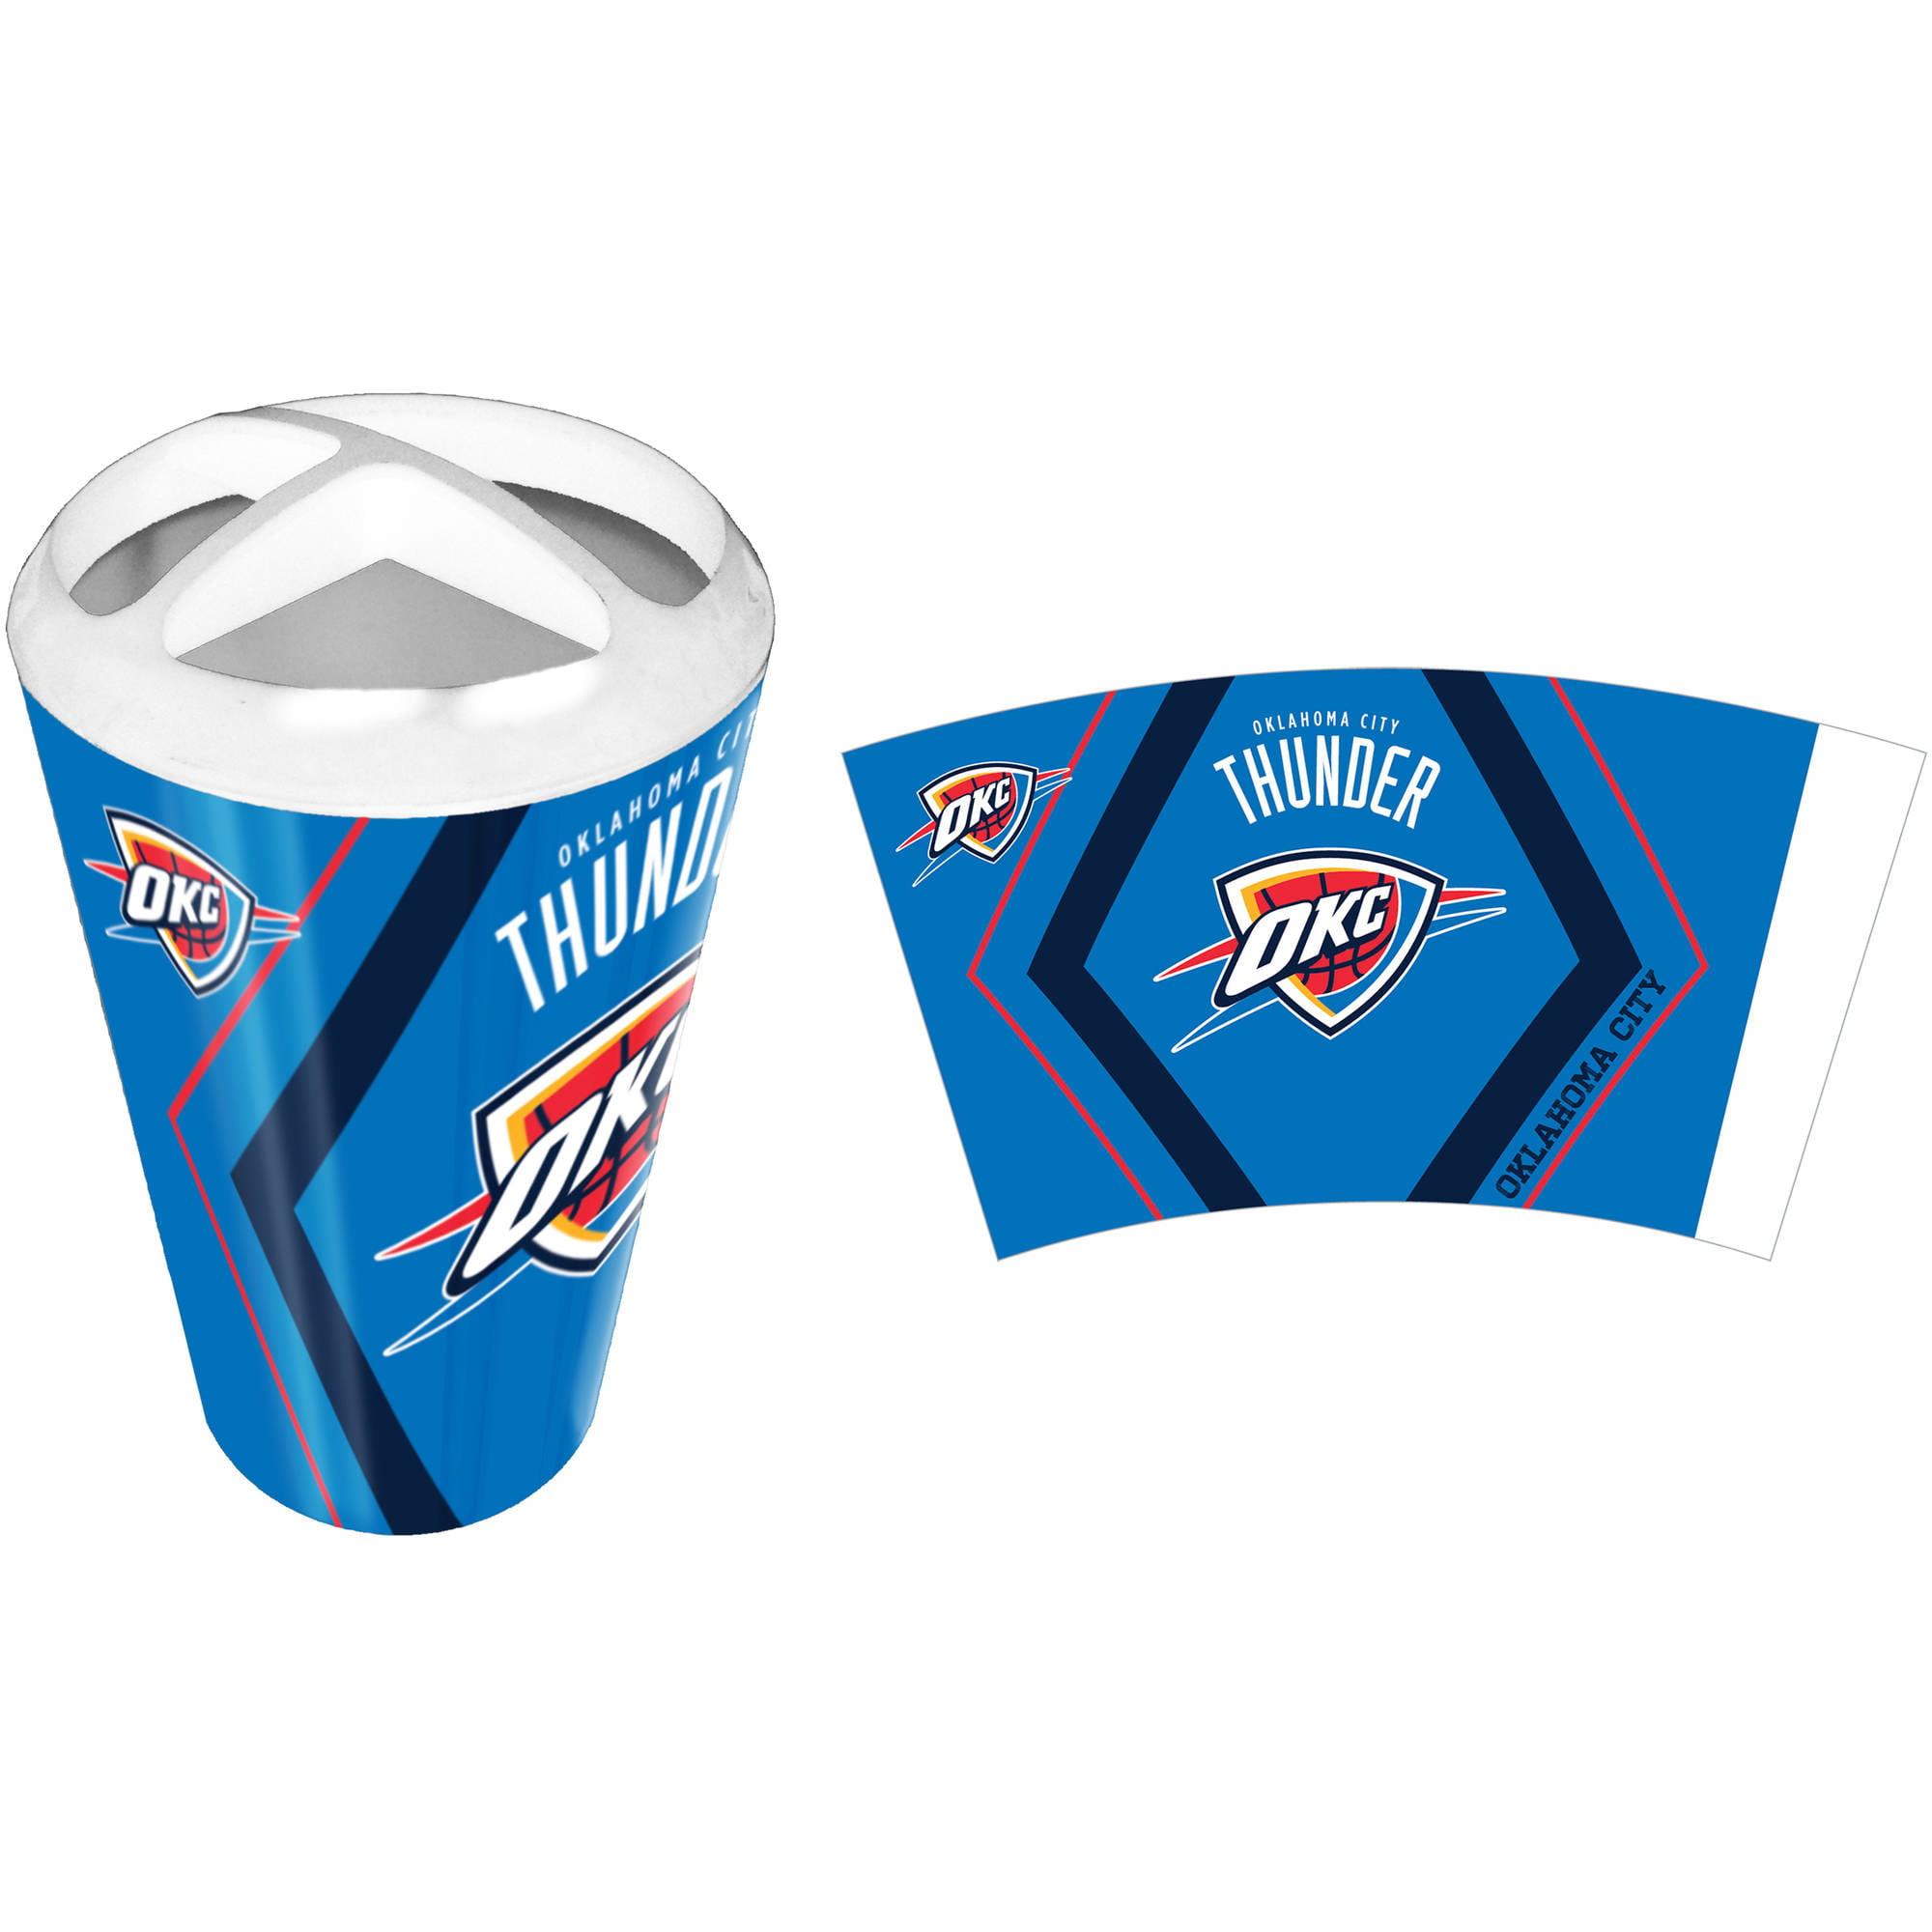 NBA Oklahoma City Thunder Toothbrush Holder, 1 Each